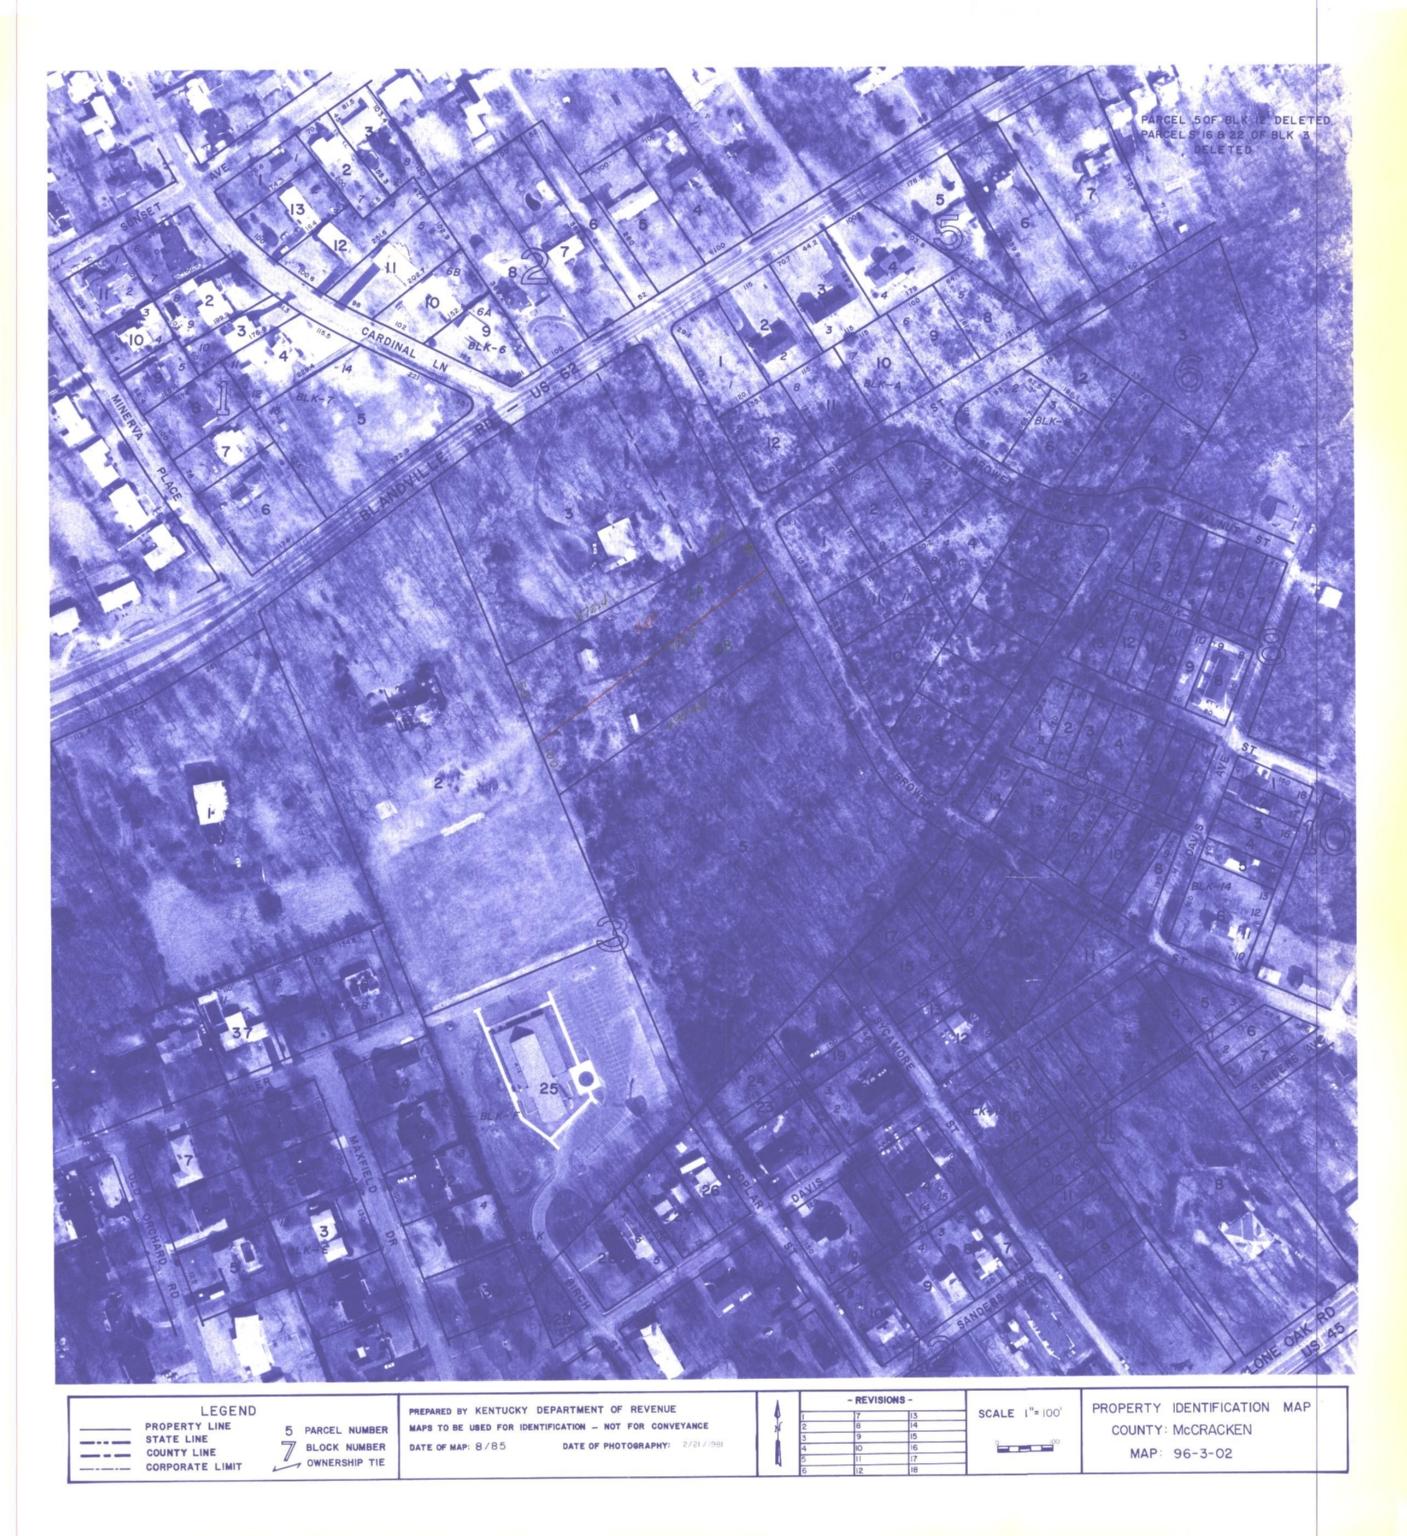 Property Identification Map McCracken County, Map 96-3-02